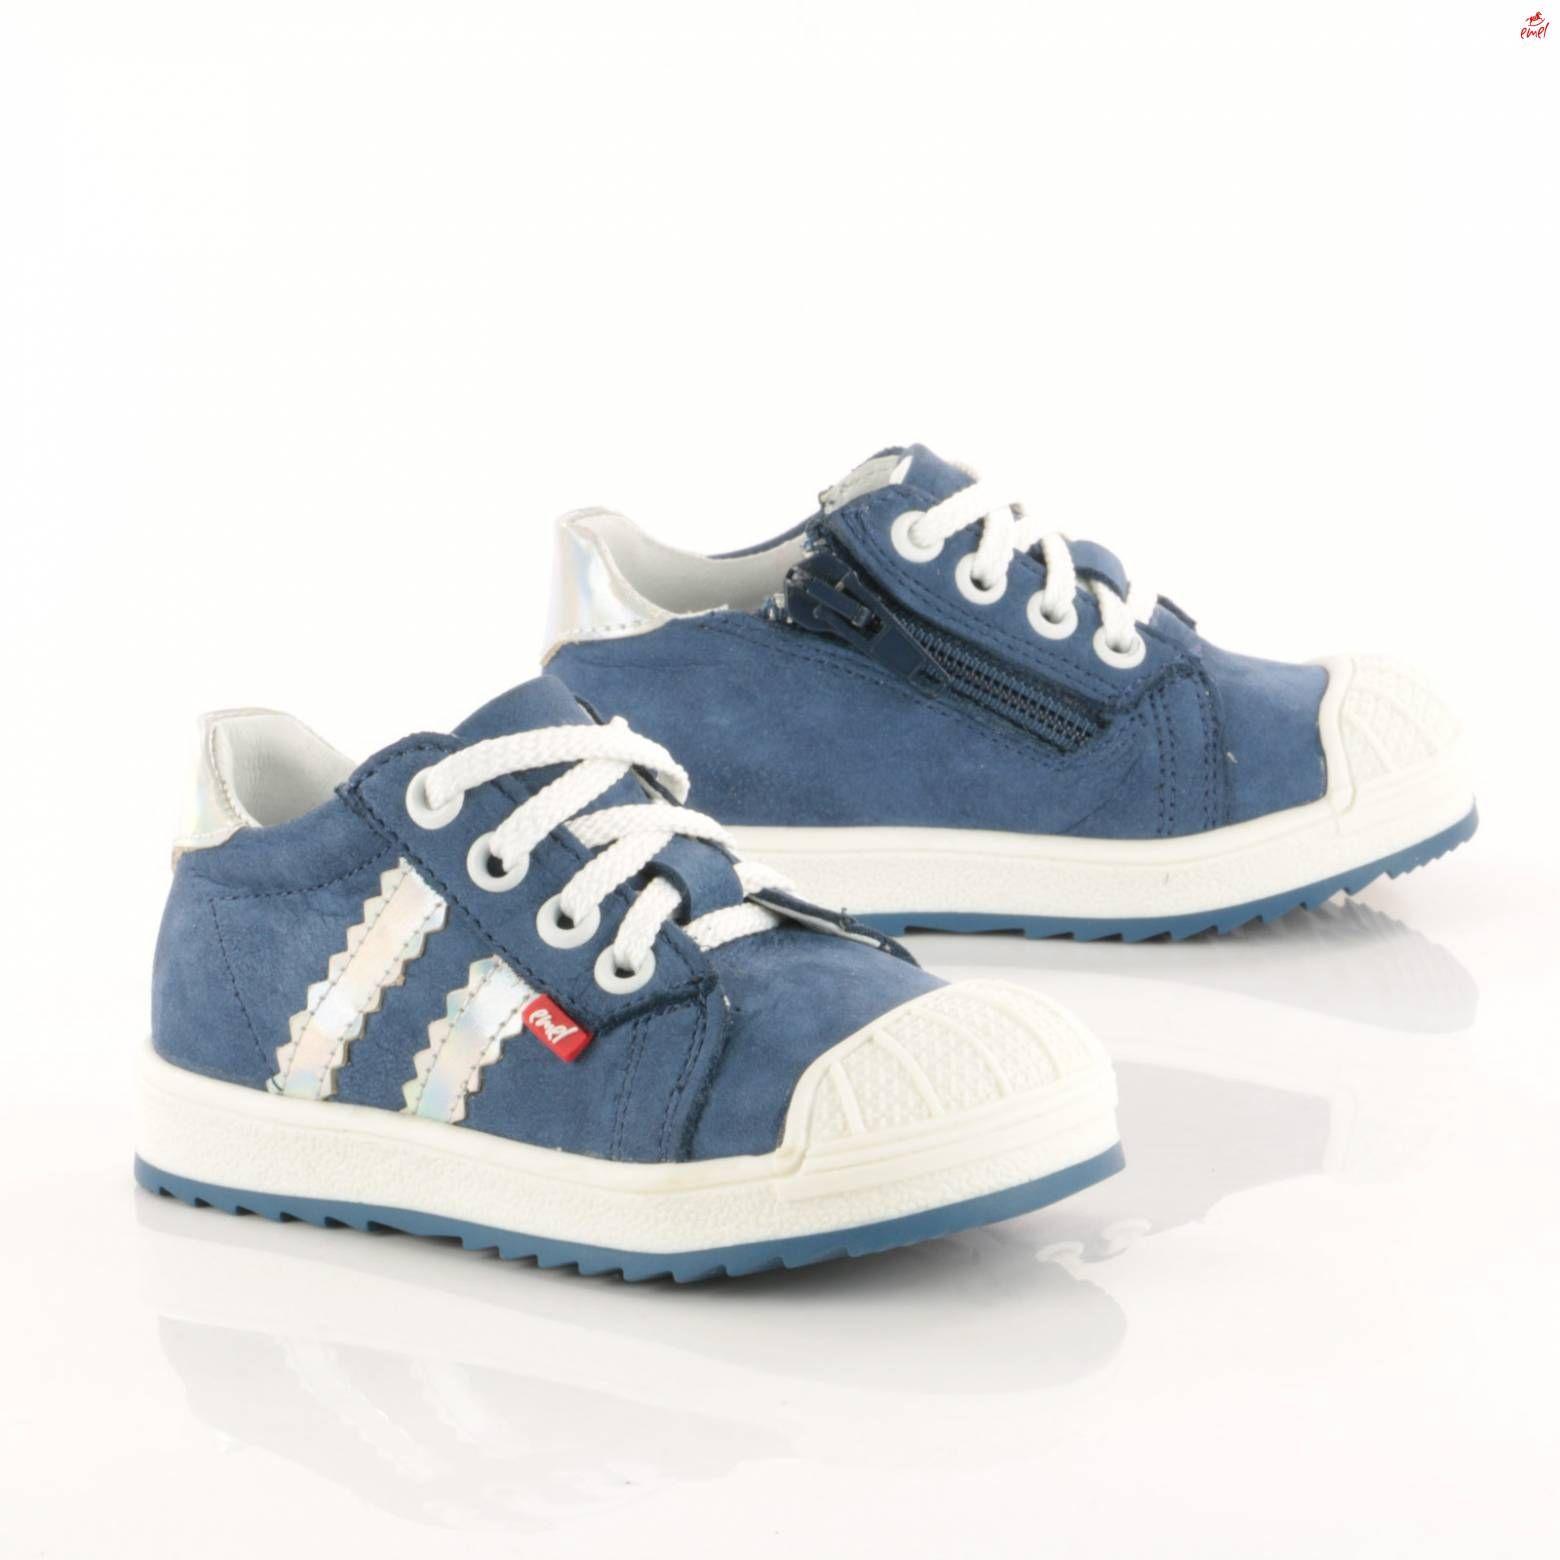 Emel Polski Producent Obuwia Dla Dzieci Adidas Sneakers Superga Sneaker Adidas Gazelle Sneaker